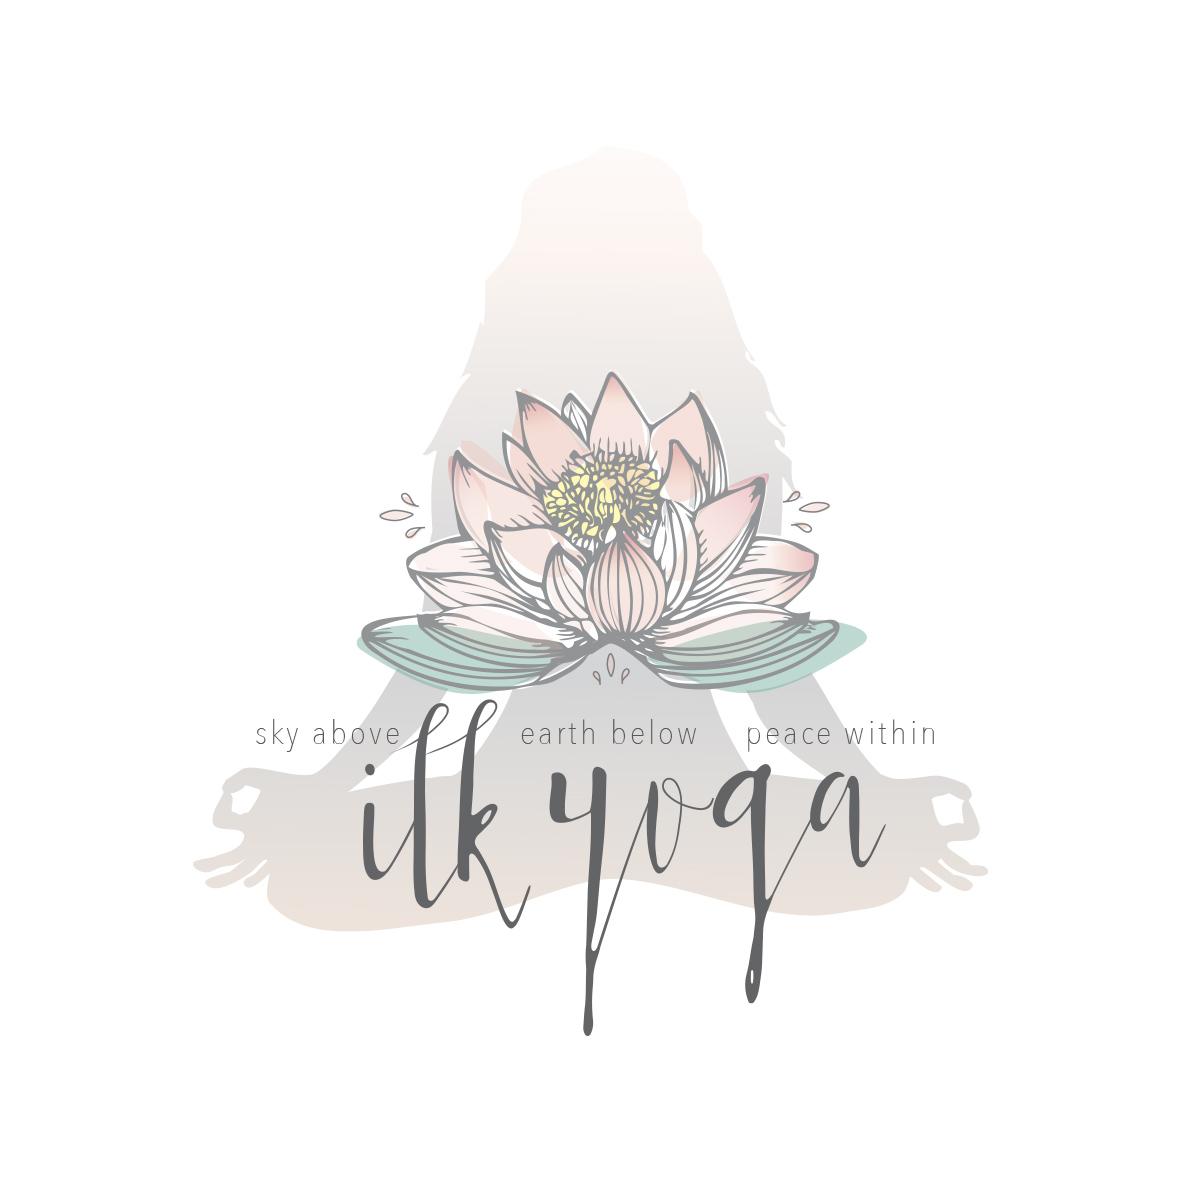 Beautiful Yoga logo design and Yoga business branding by graphic designer Lara Hardy from Billie Hardy Creative